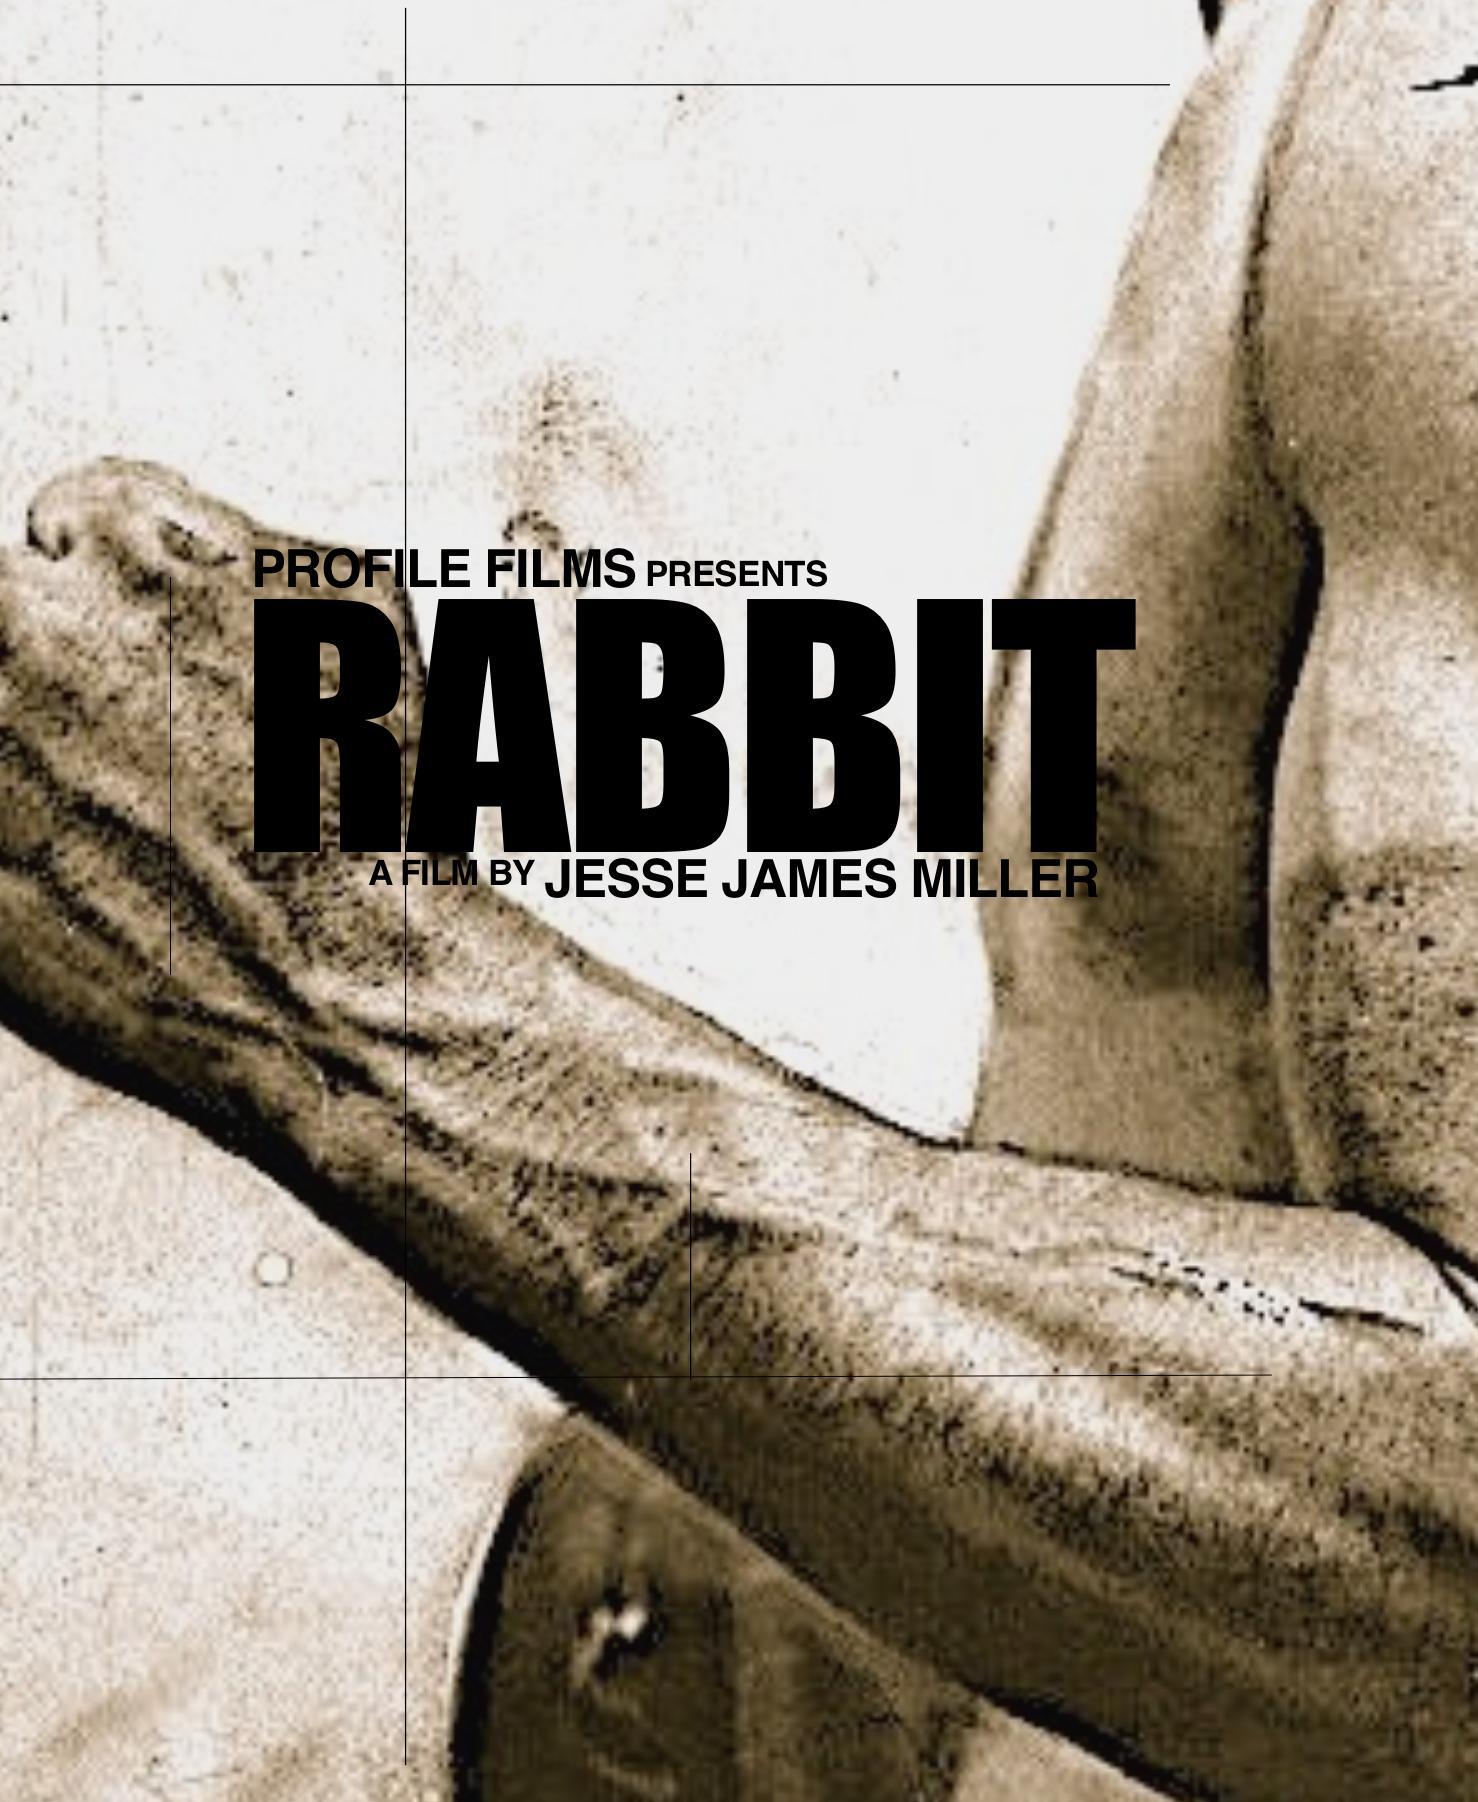 affiche du film Rabbit